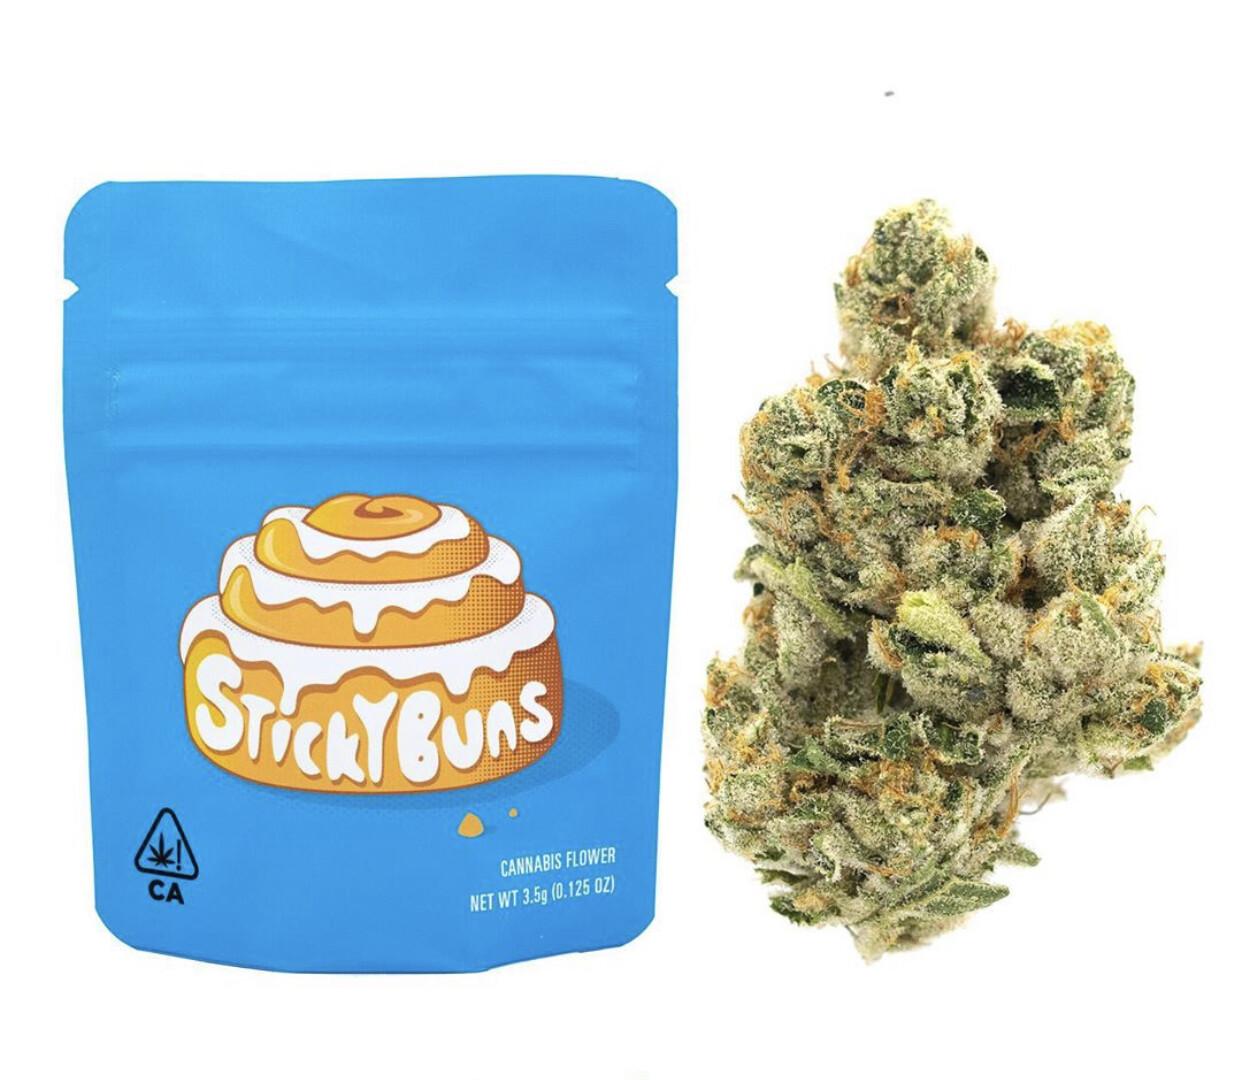 Sticky buns cookies strain